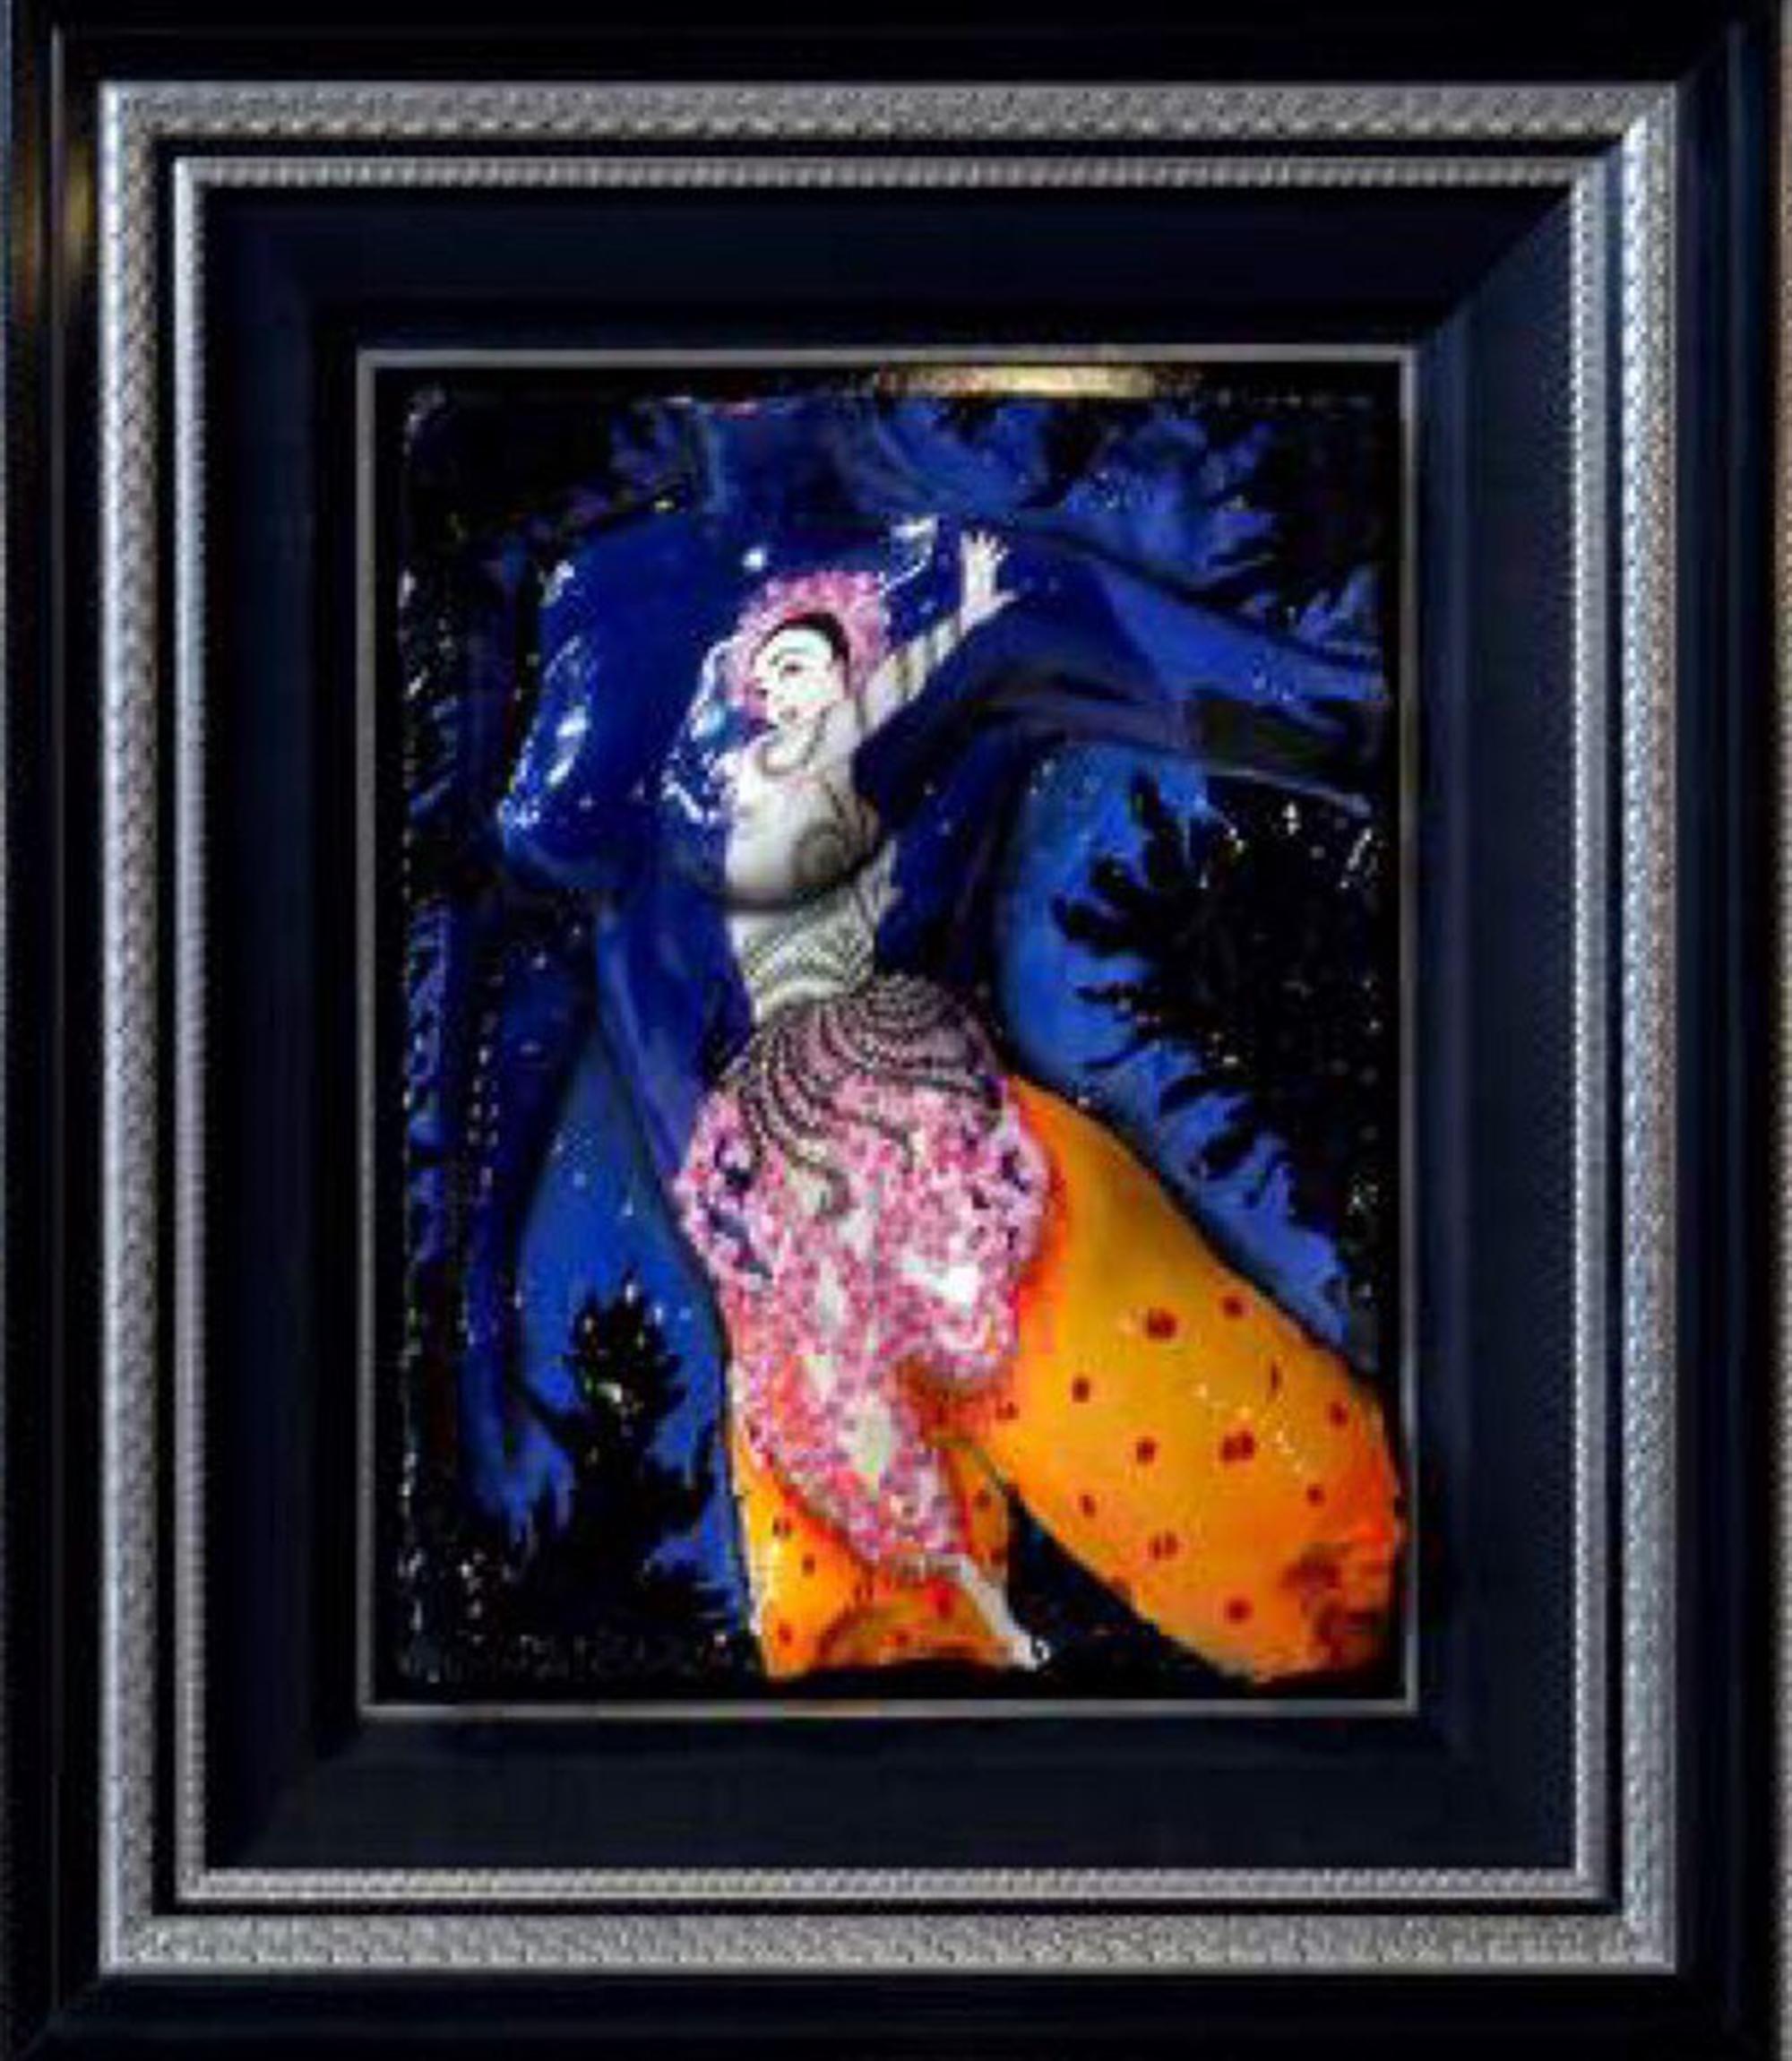 Spirit Erte Flowers in Detail by Bill Mack